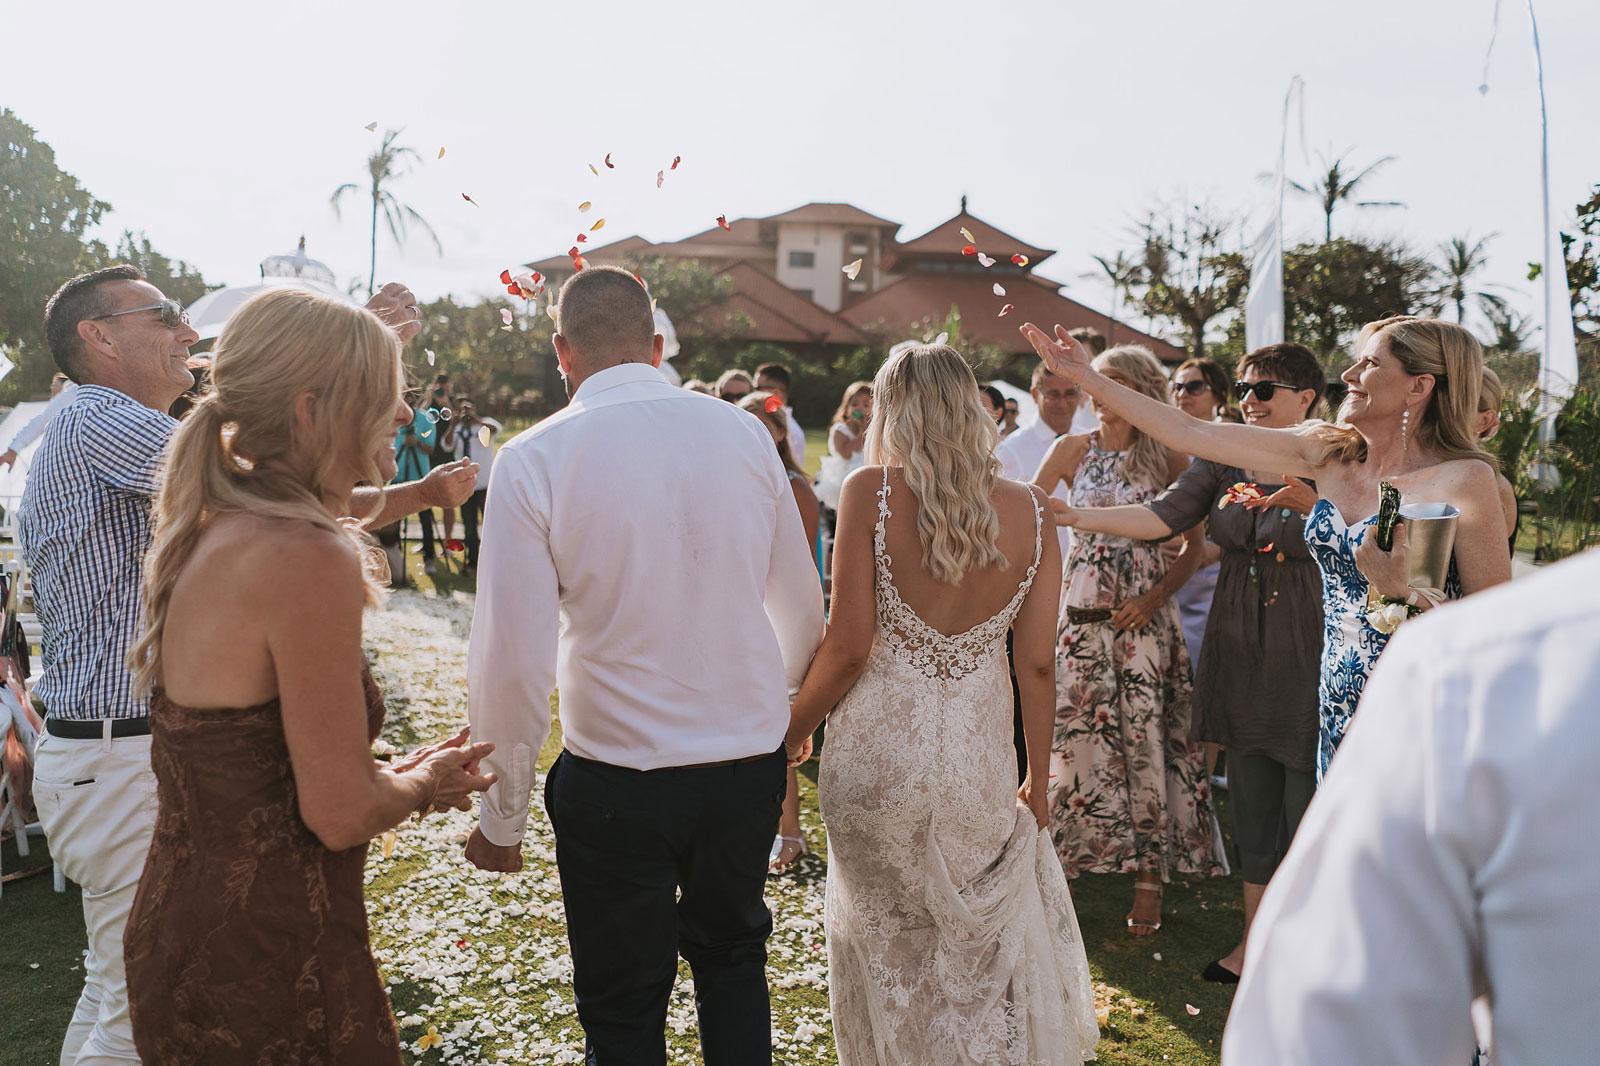 newfound-j-j-bali-nusa-dua-wedding-wedding-photographer-053-a